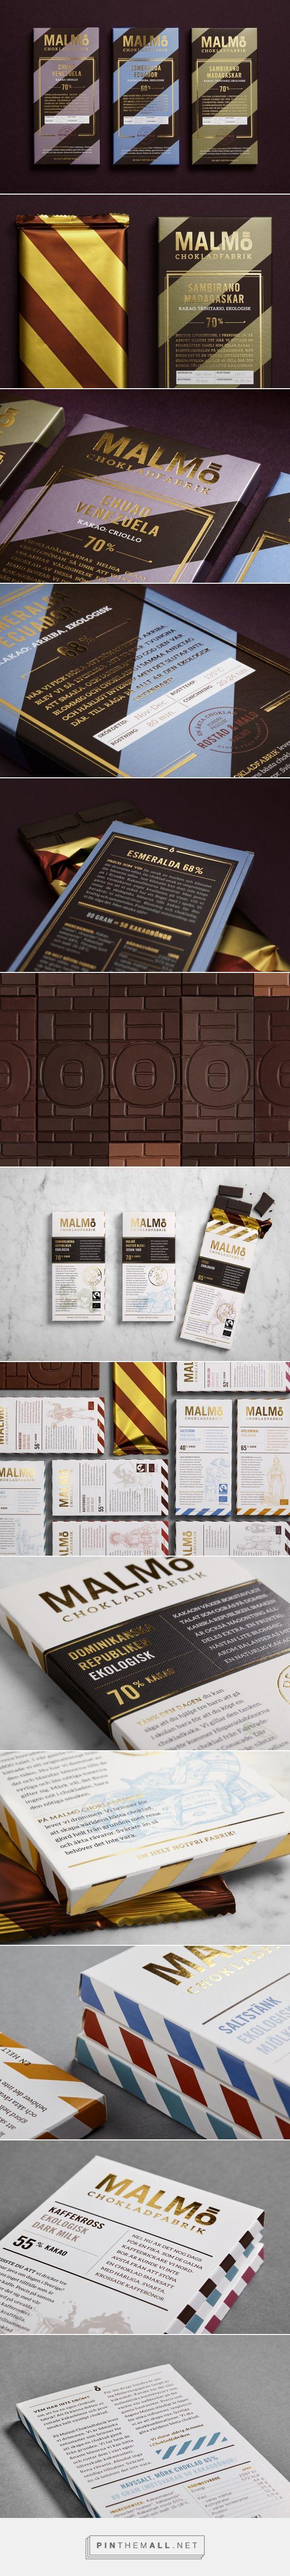 Malmö Chokladfabrik Chocolate packaging design by Pond Design - http://www.packagingoftheworld.com/2017/06/malmo-chokladfabrik-redesign.html